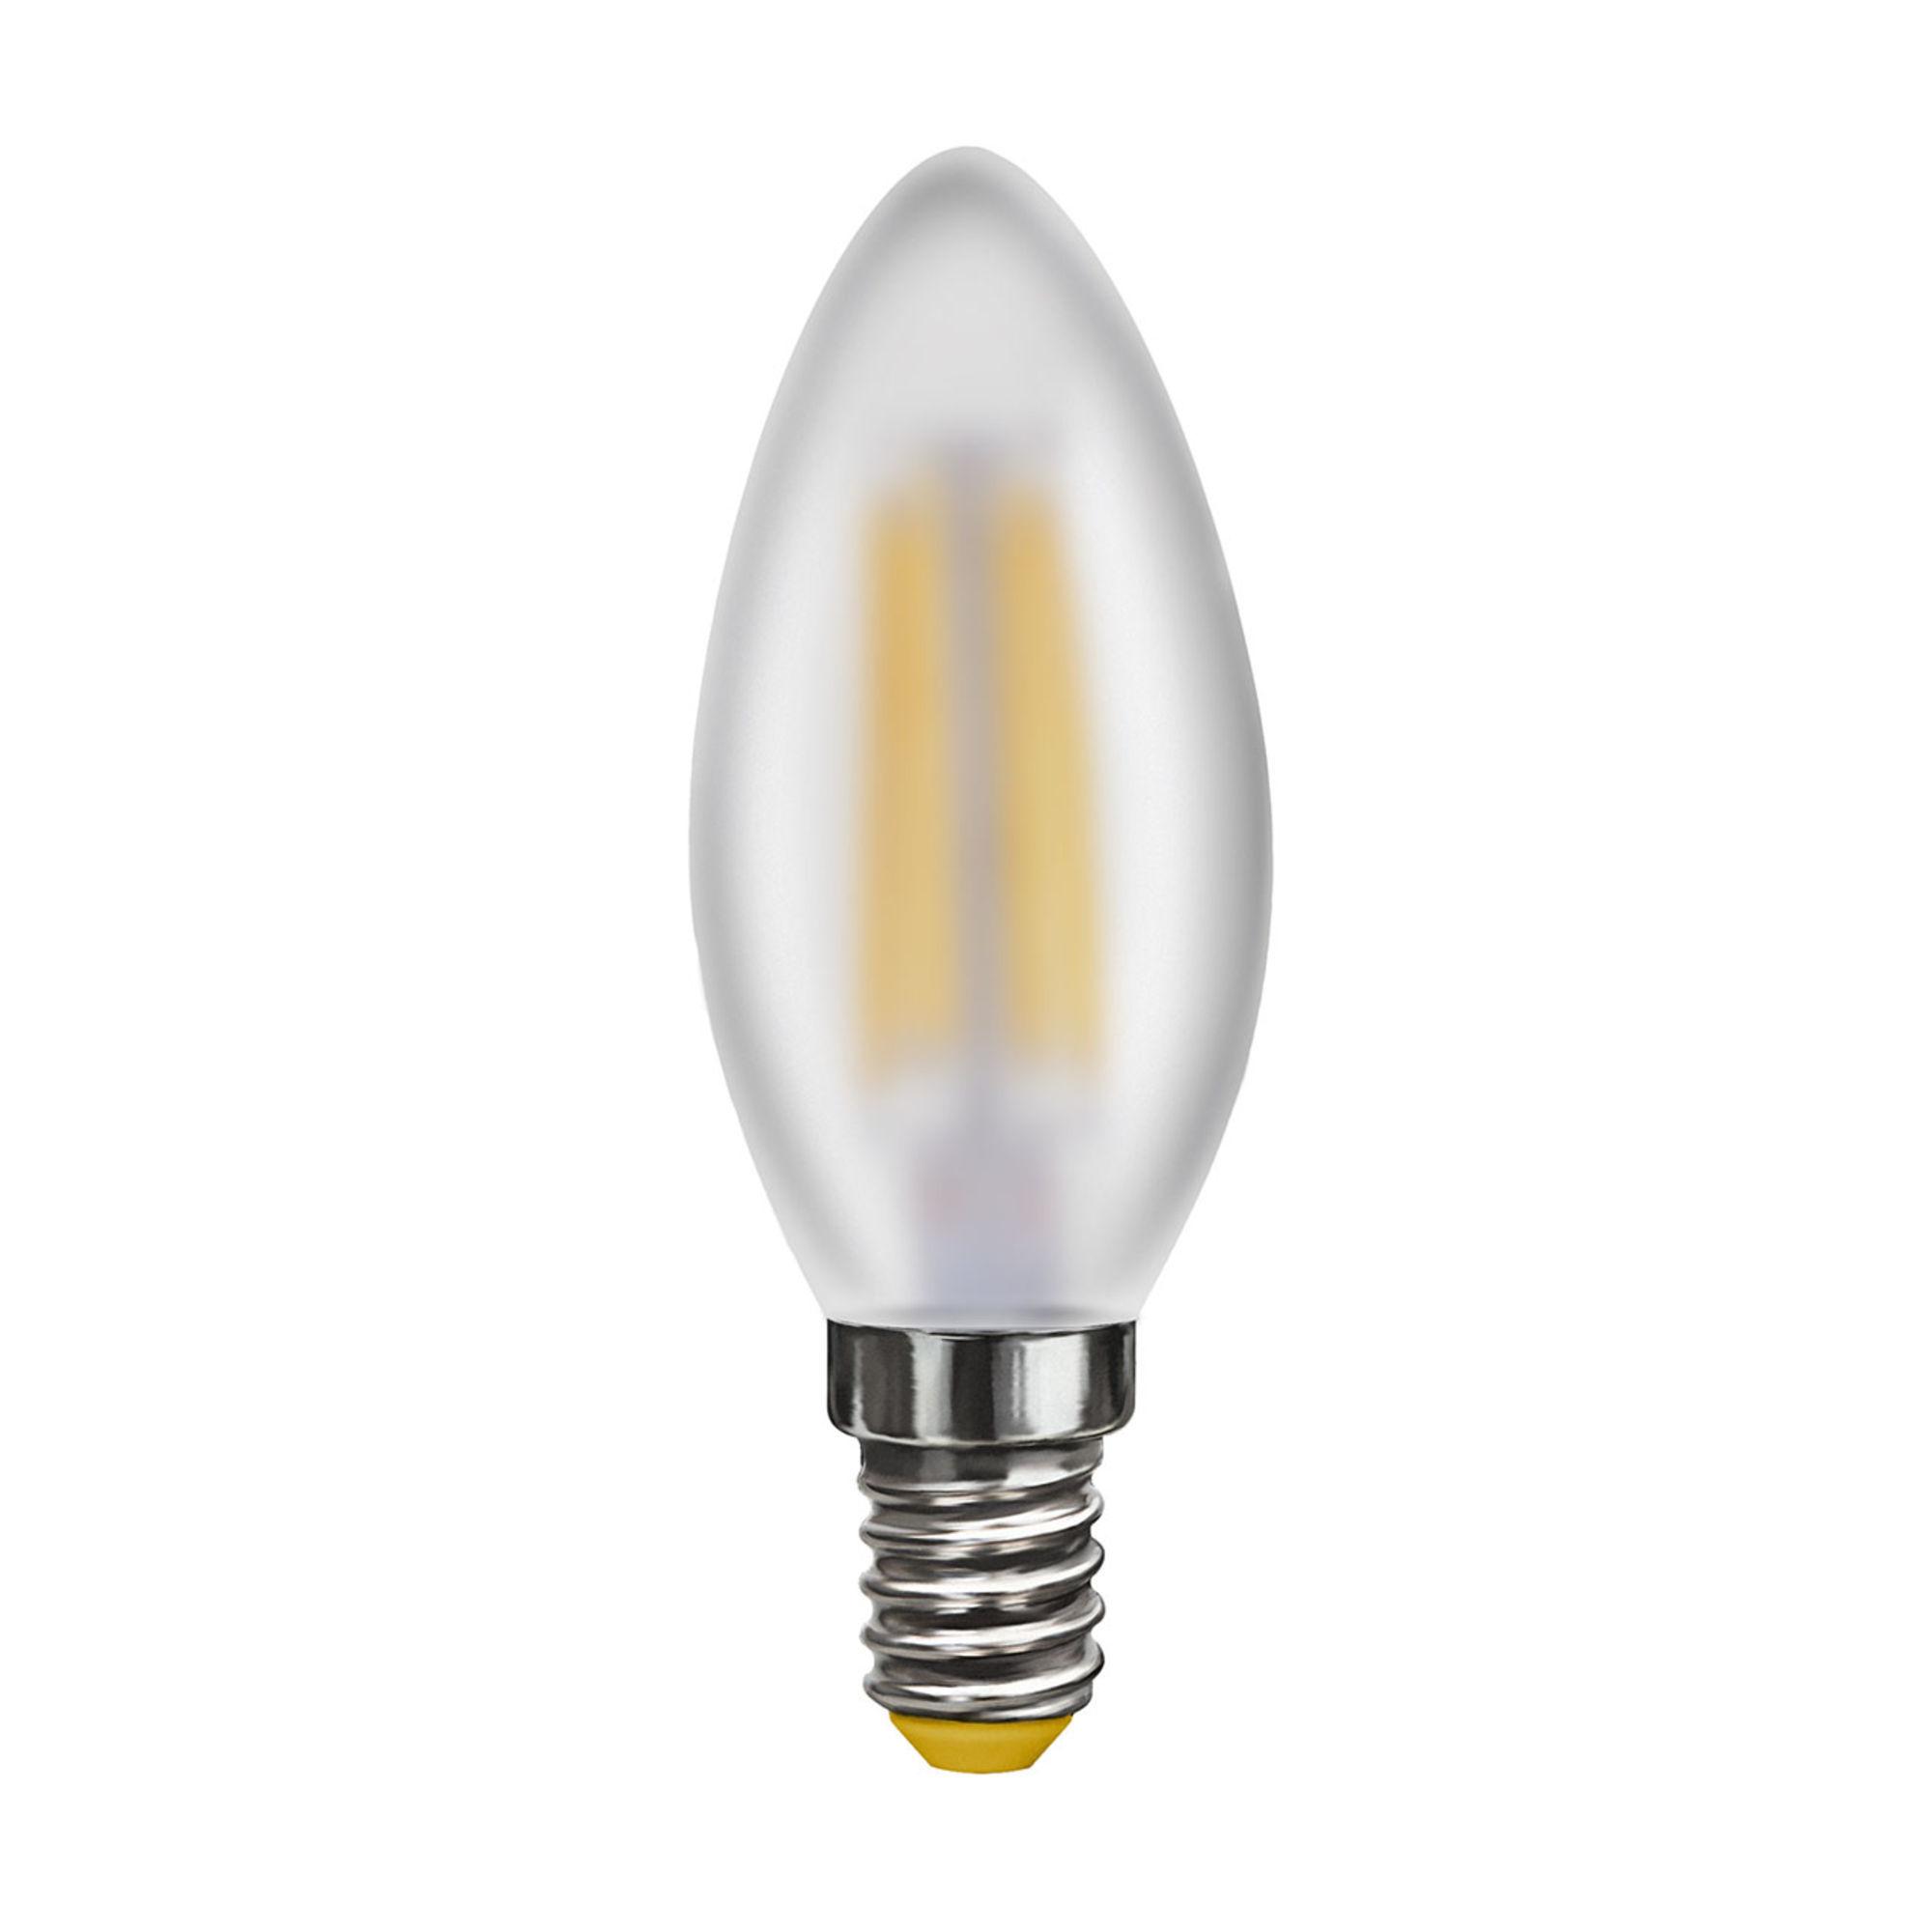 Филаментная светодиодная лампа Voltega Crystal 7044 свеча E14 6W, 2800K (теплый) CRI80 220V, гарантия 3 года - фото 1